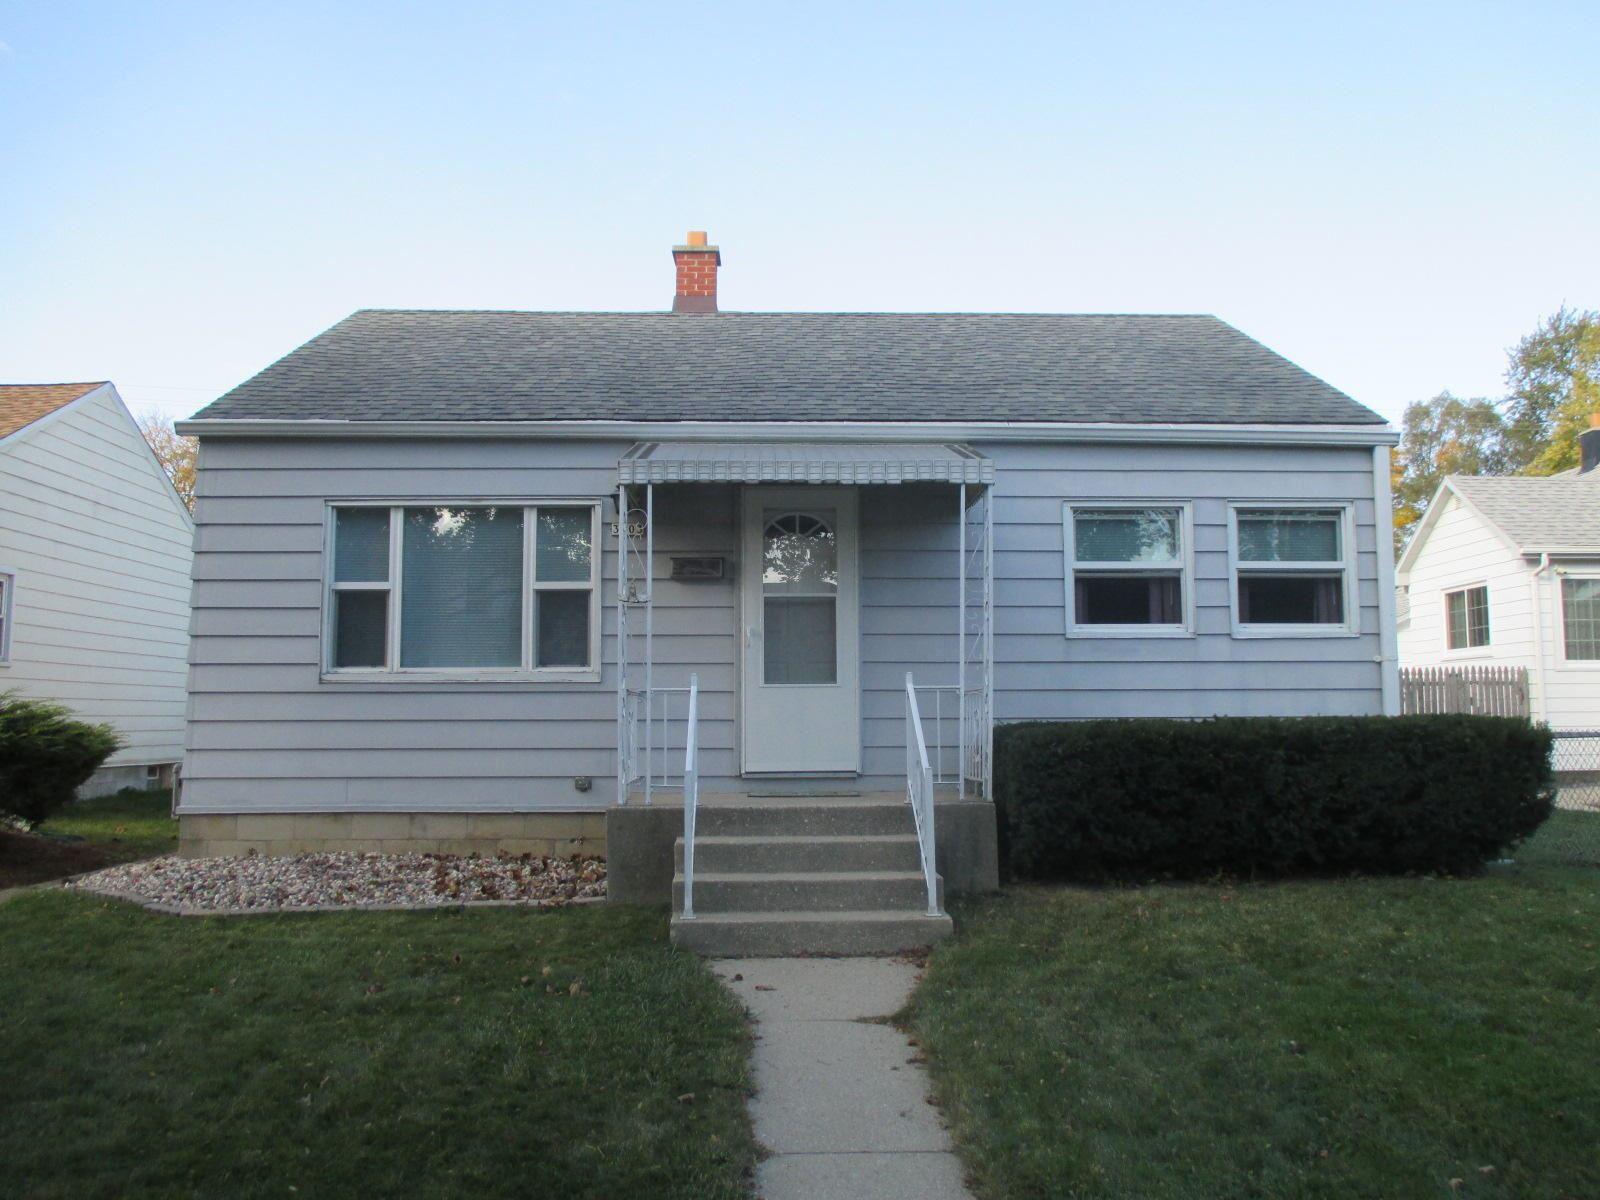 3803 S Lenox St, Milwaukee, WI 53207 - #: 1715339